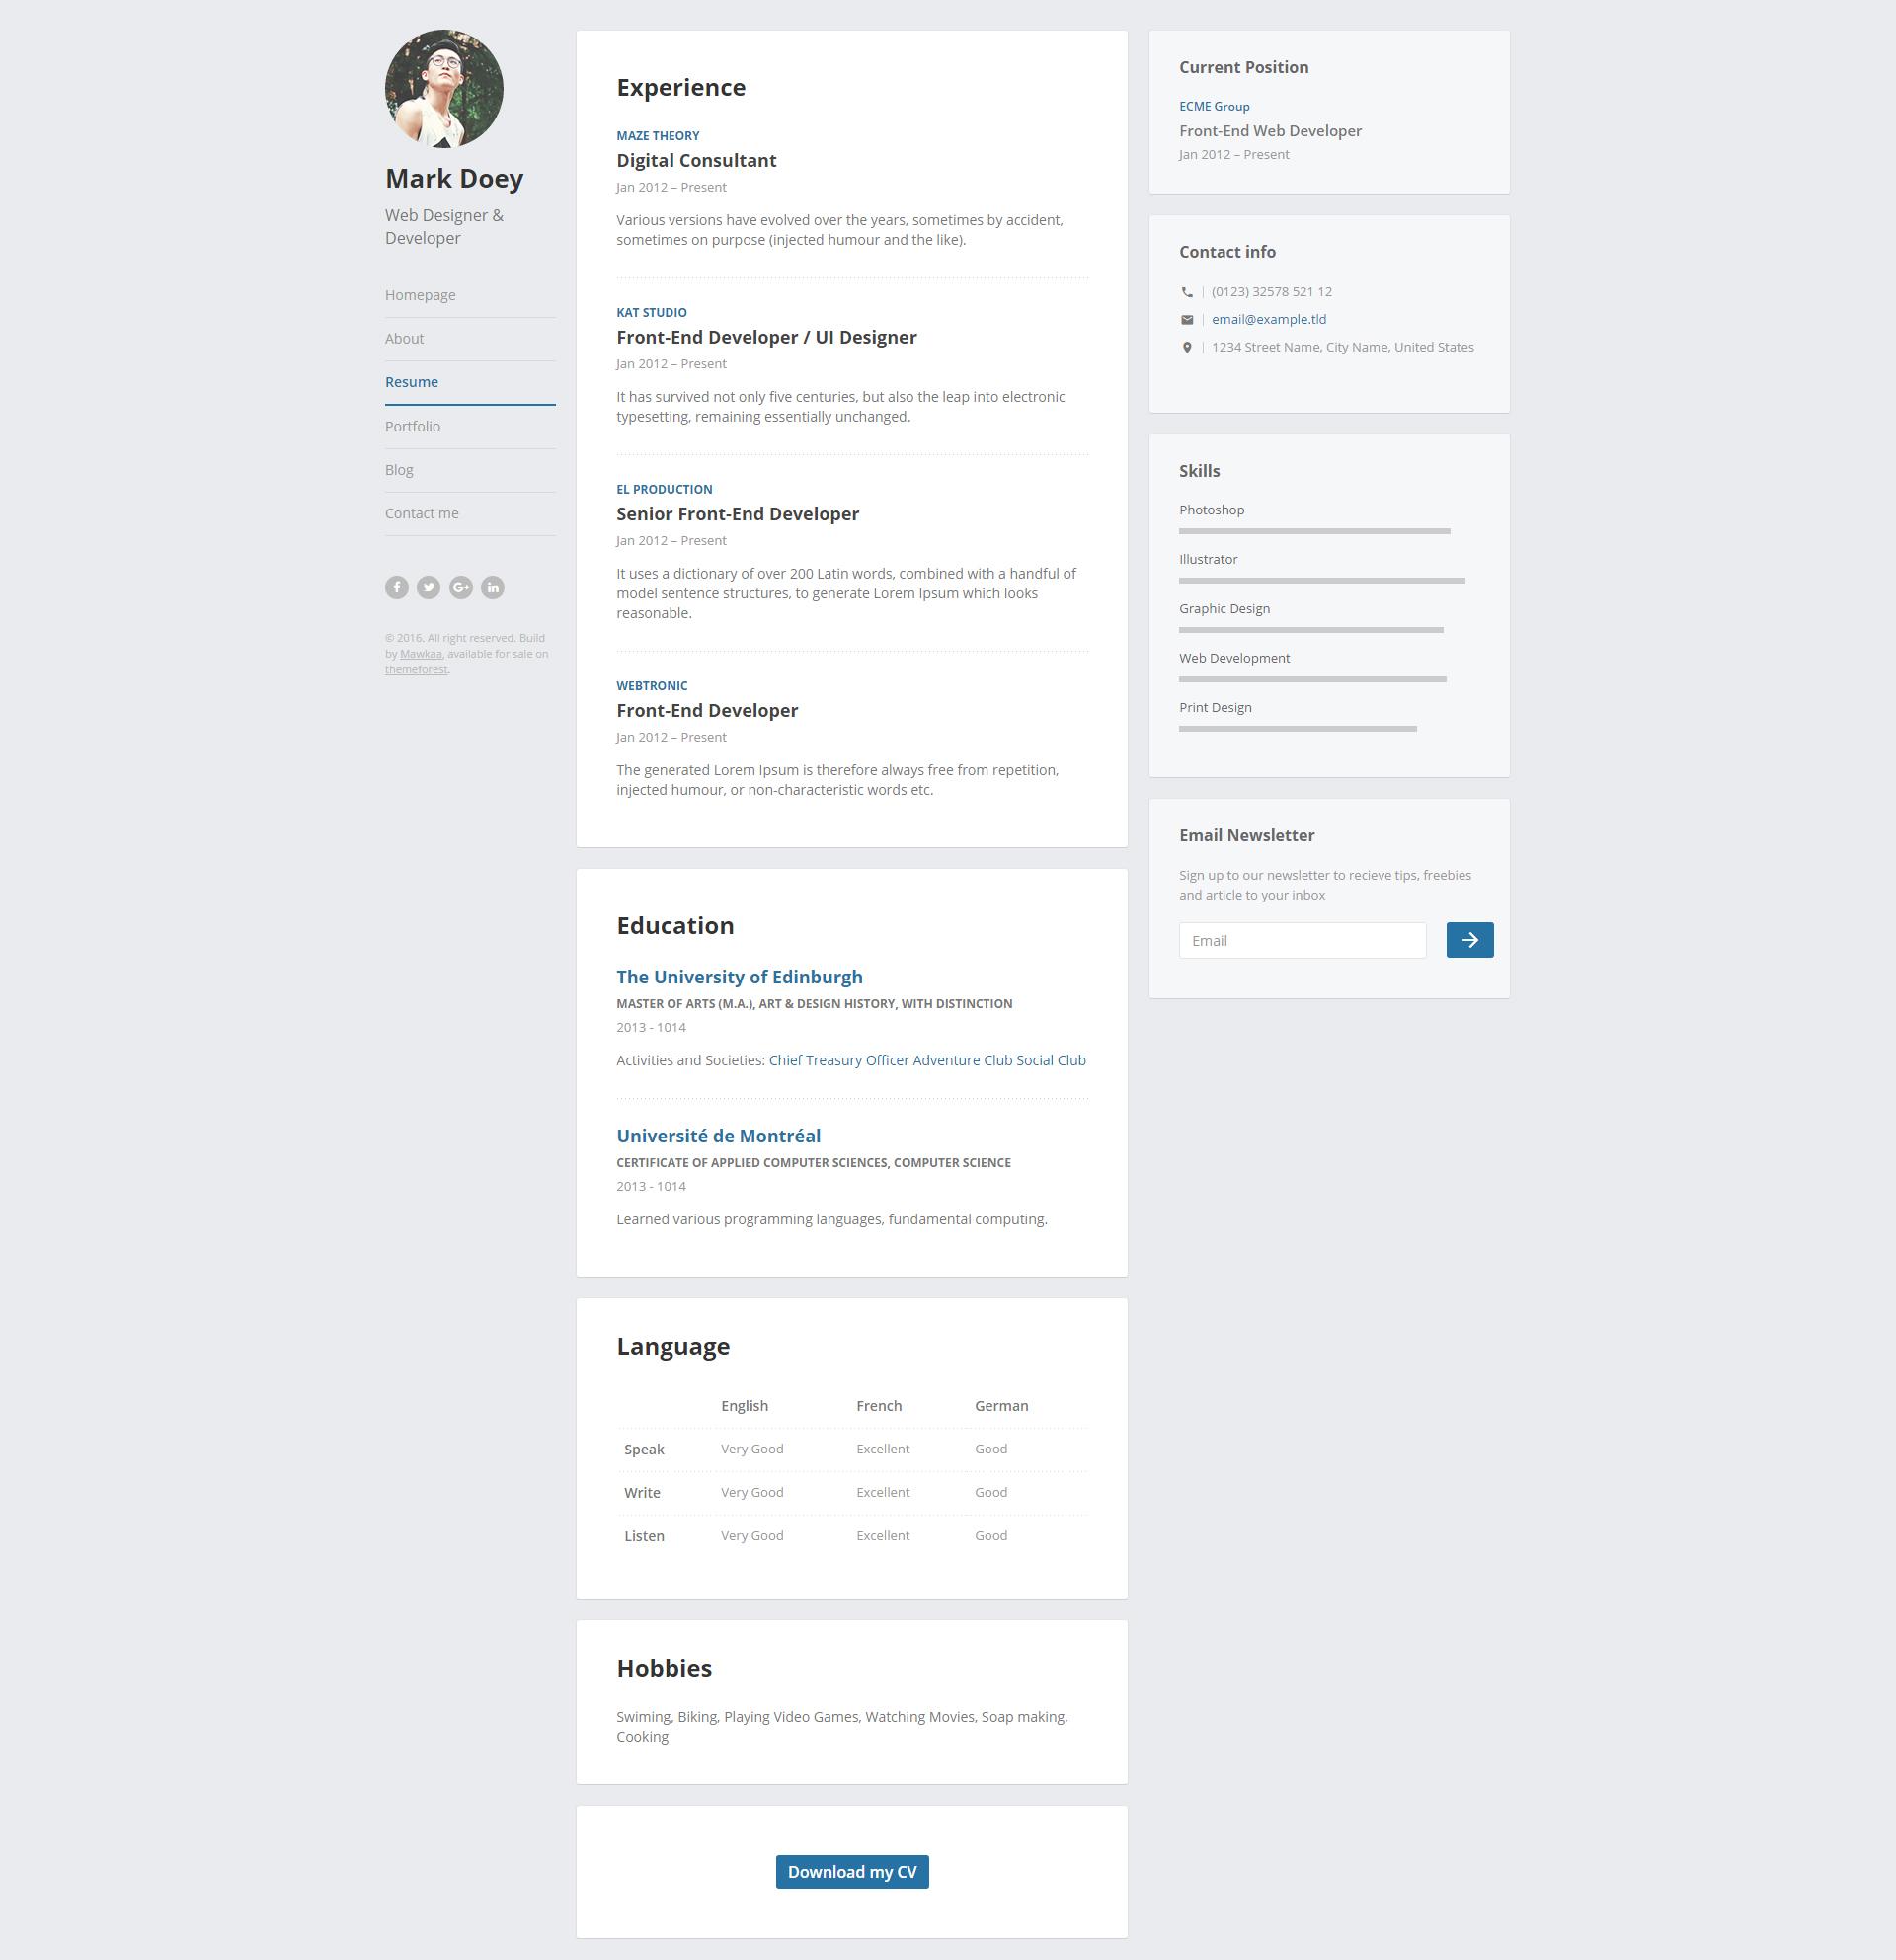 Prosume - Resume / CV & Virtual Business Card (vCard) by Mawkaa ...